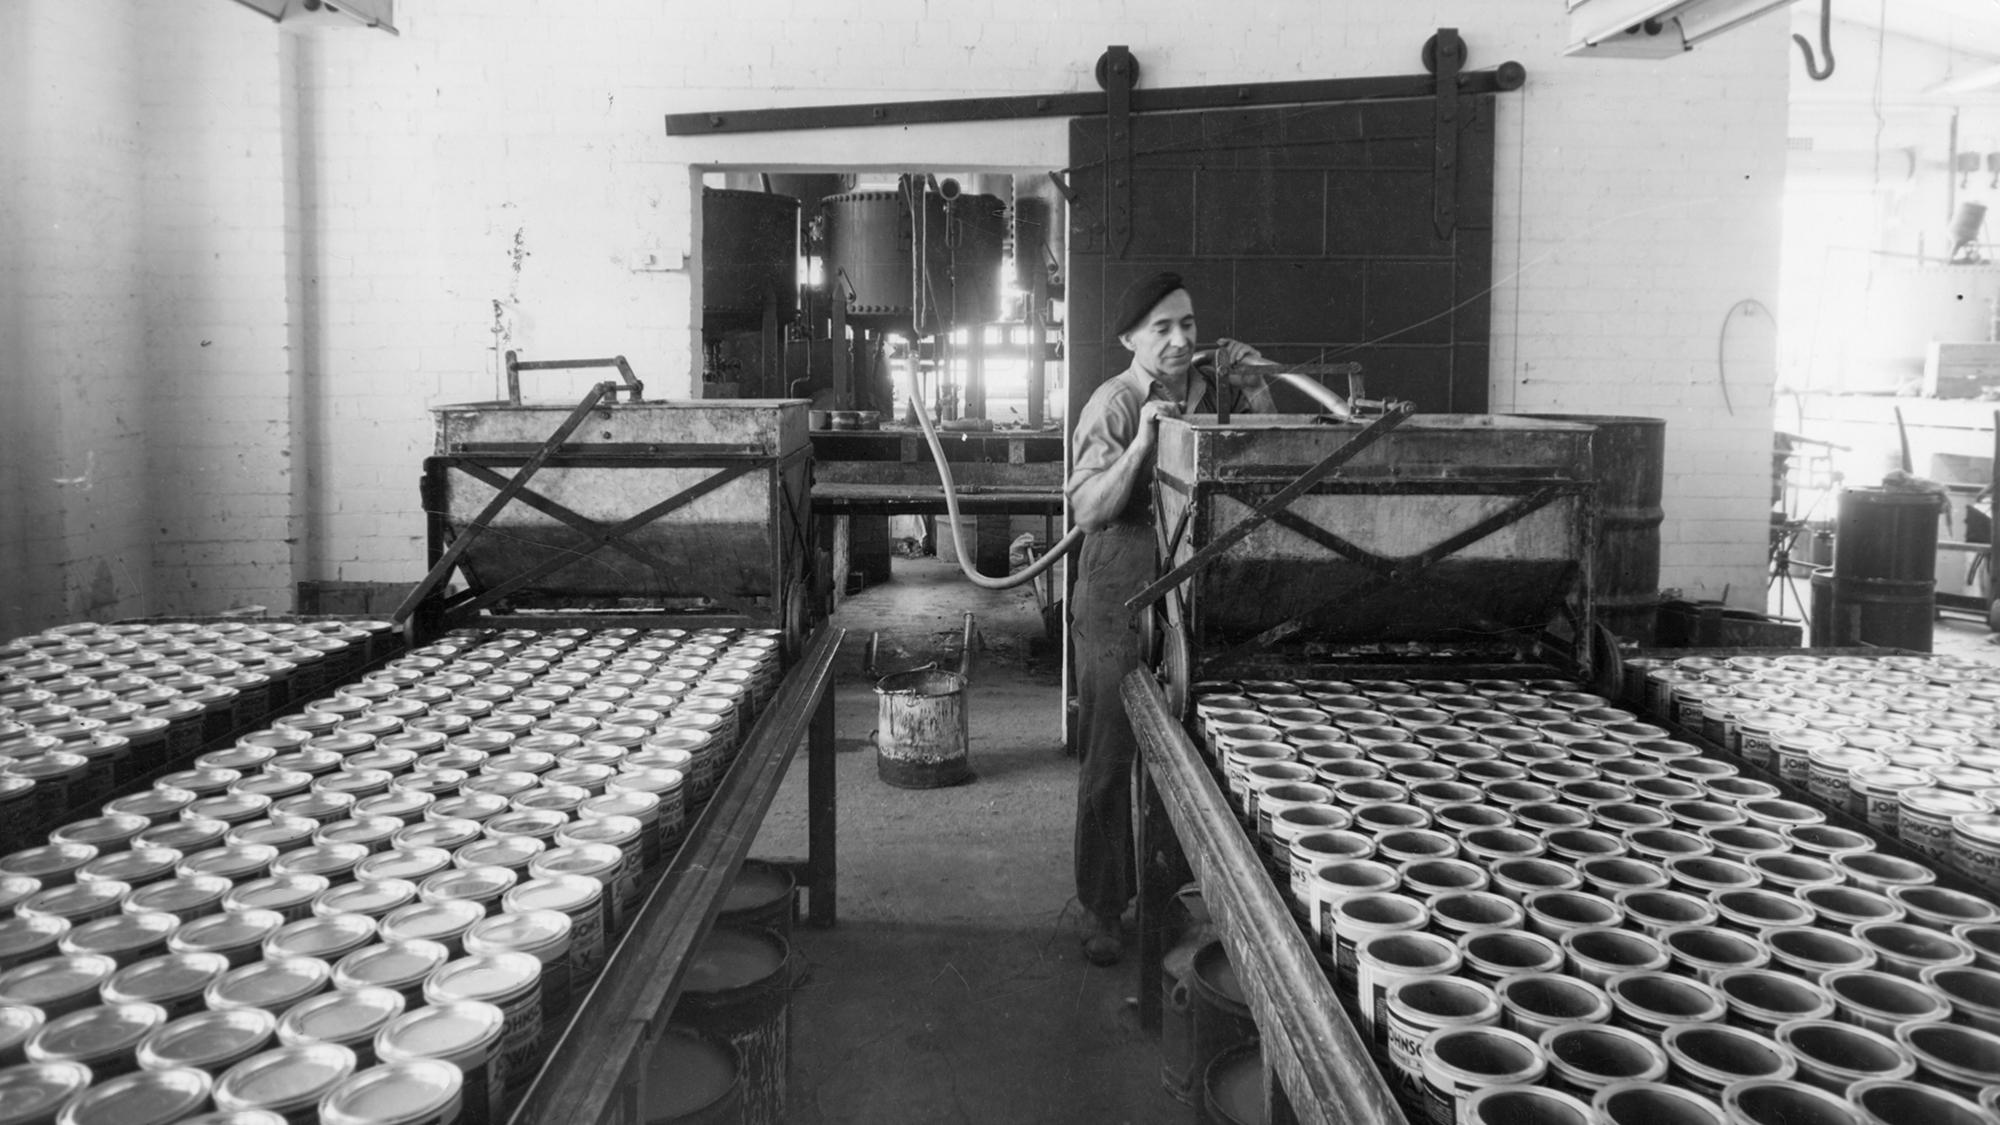 Herbert F. Johnson, Sr. 将庄臣从固蜡制造商发展成一家知名的家庭护理产品跨国公司